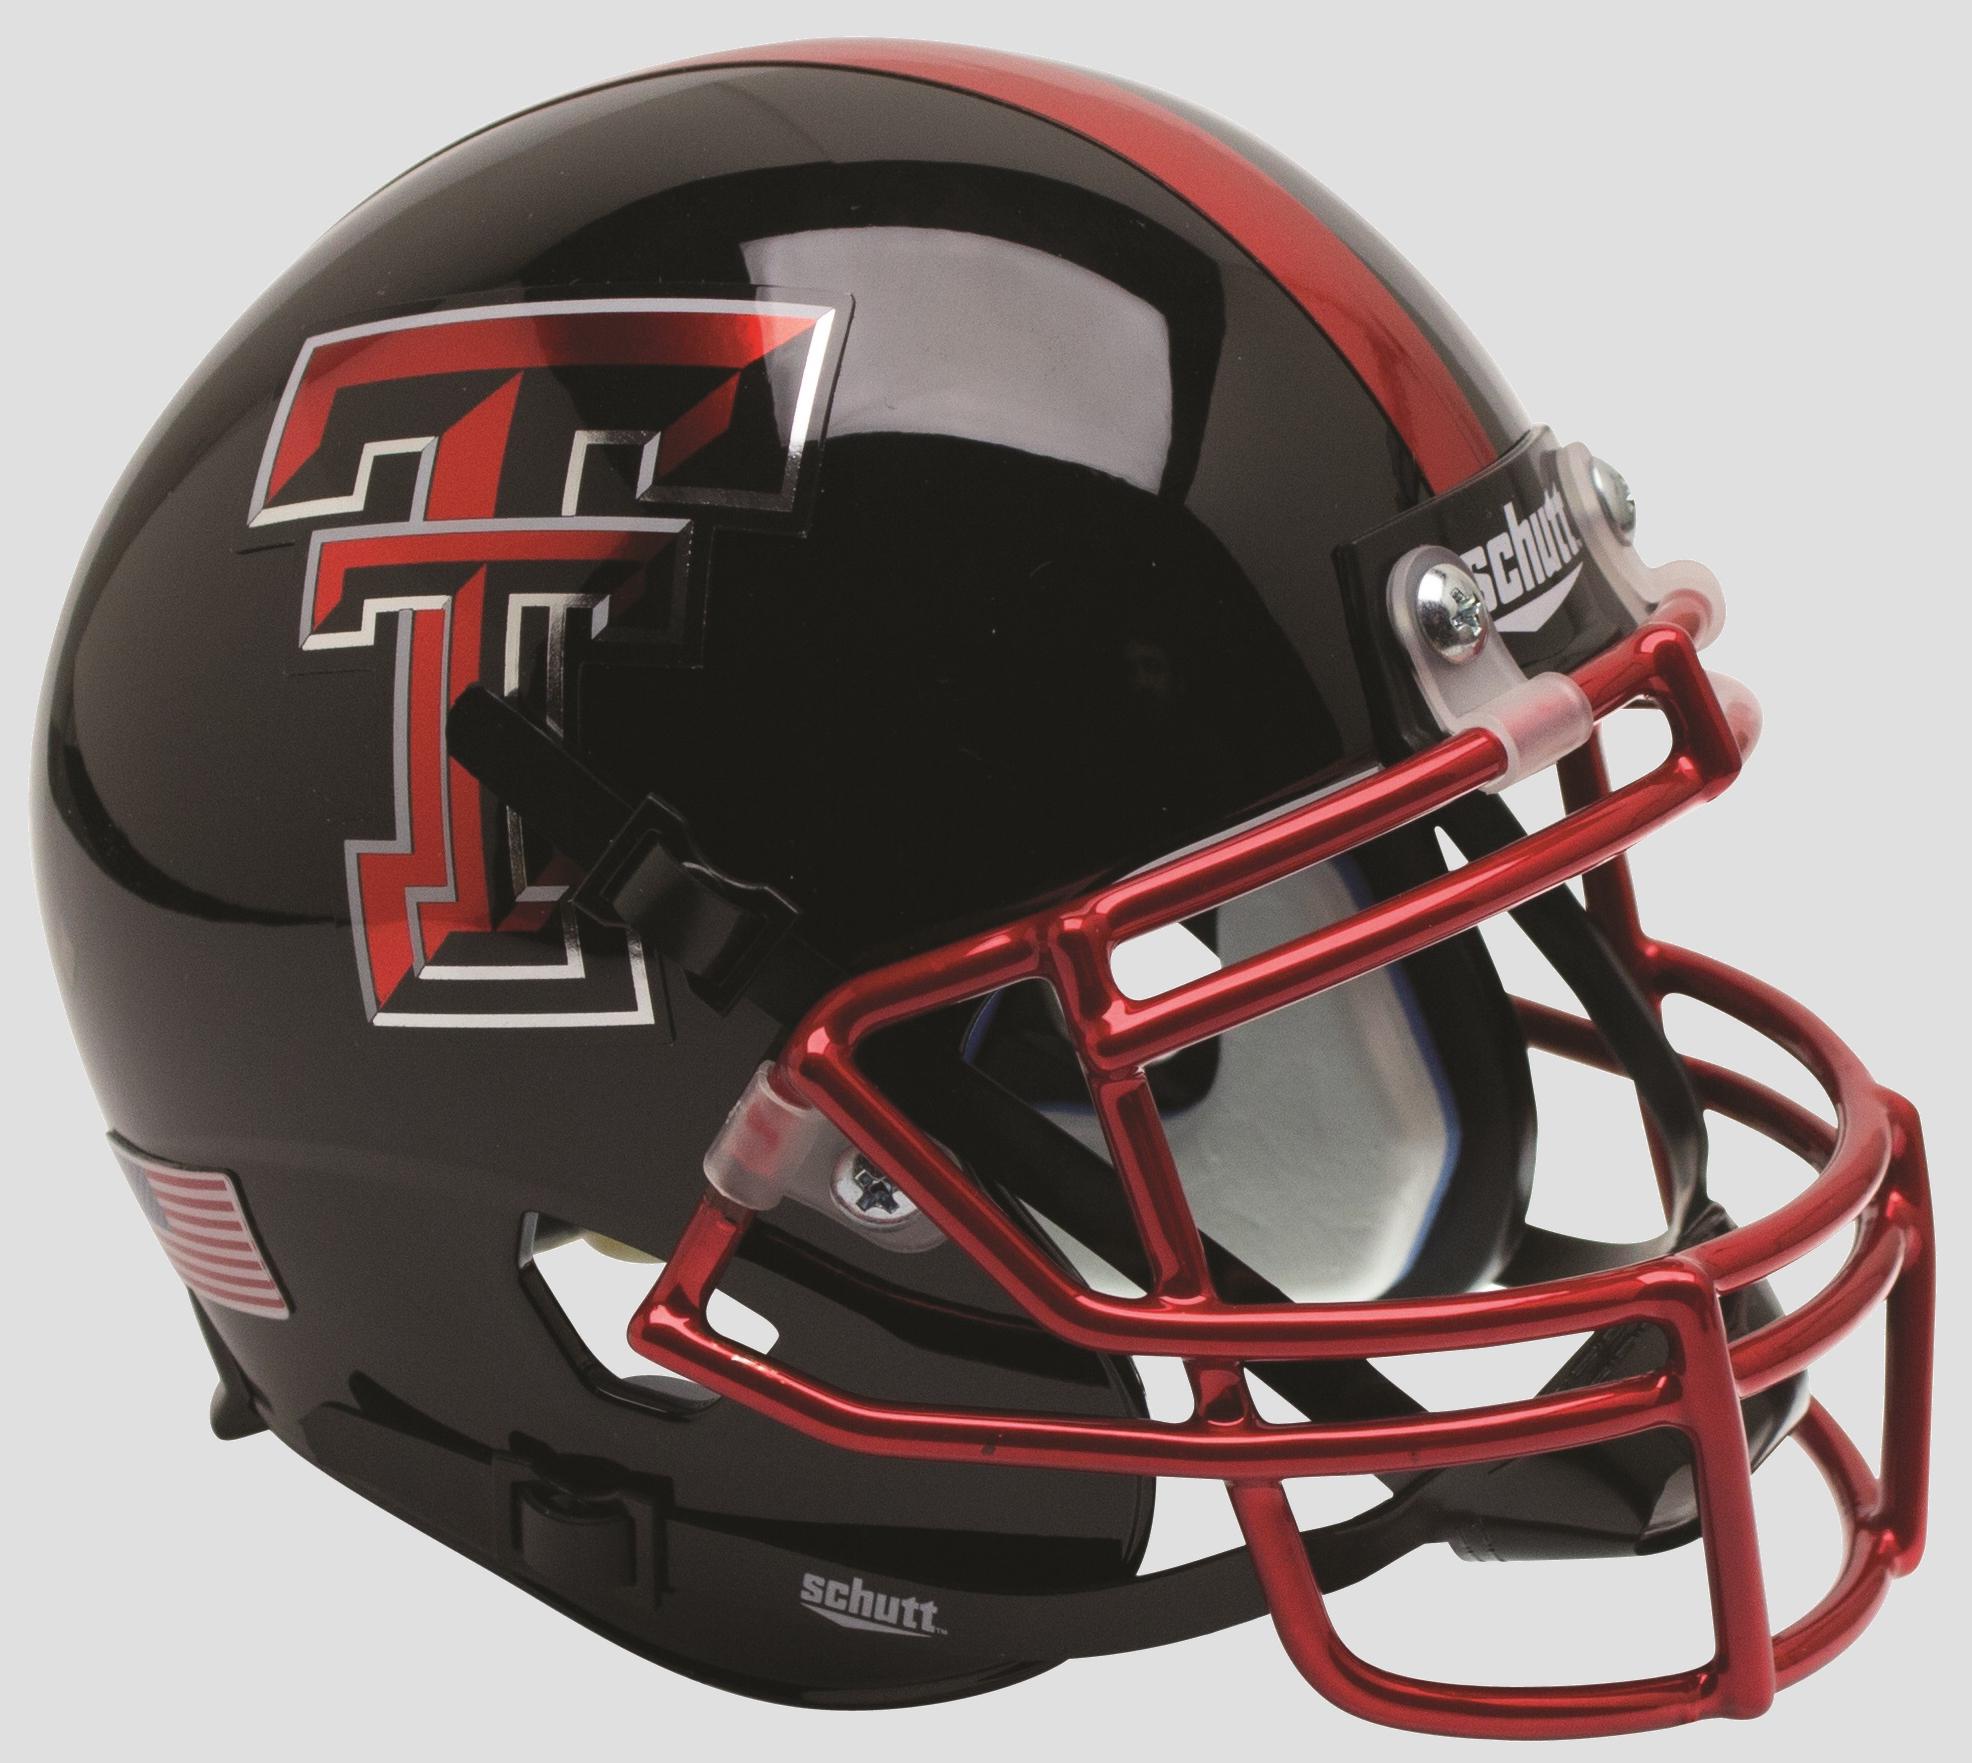 Texas Tech Red Raiders Authentic College XP Football Helmet Schutt <B>Chrome Mask Guns Up</B>